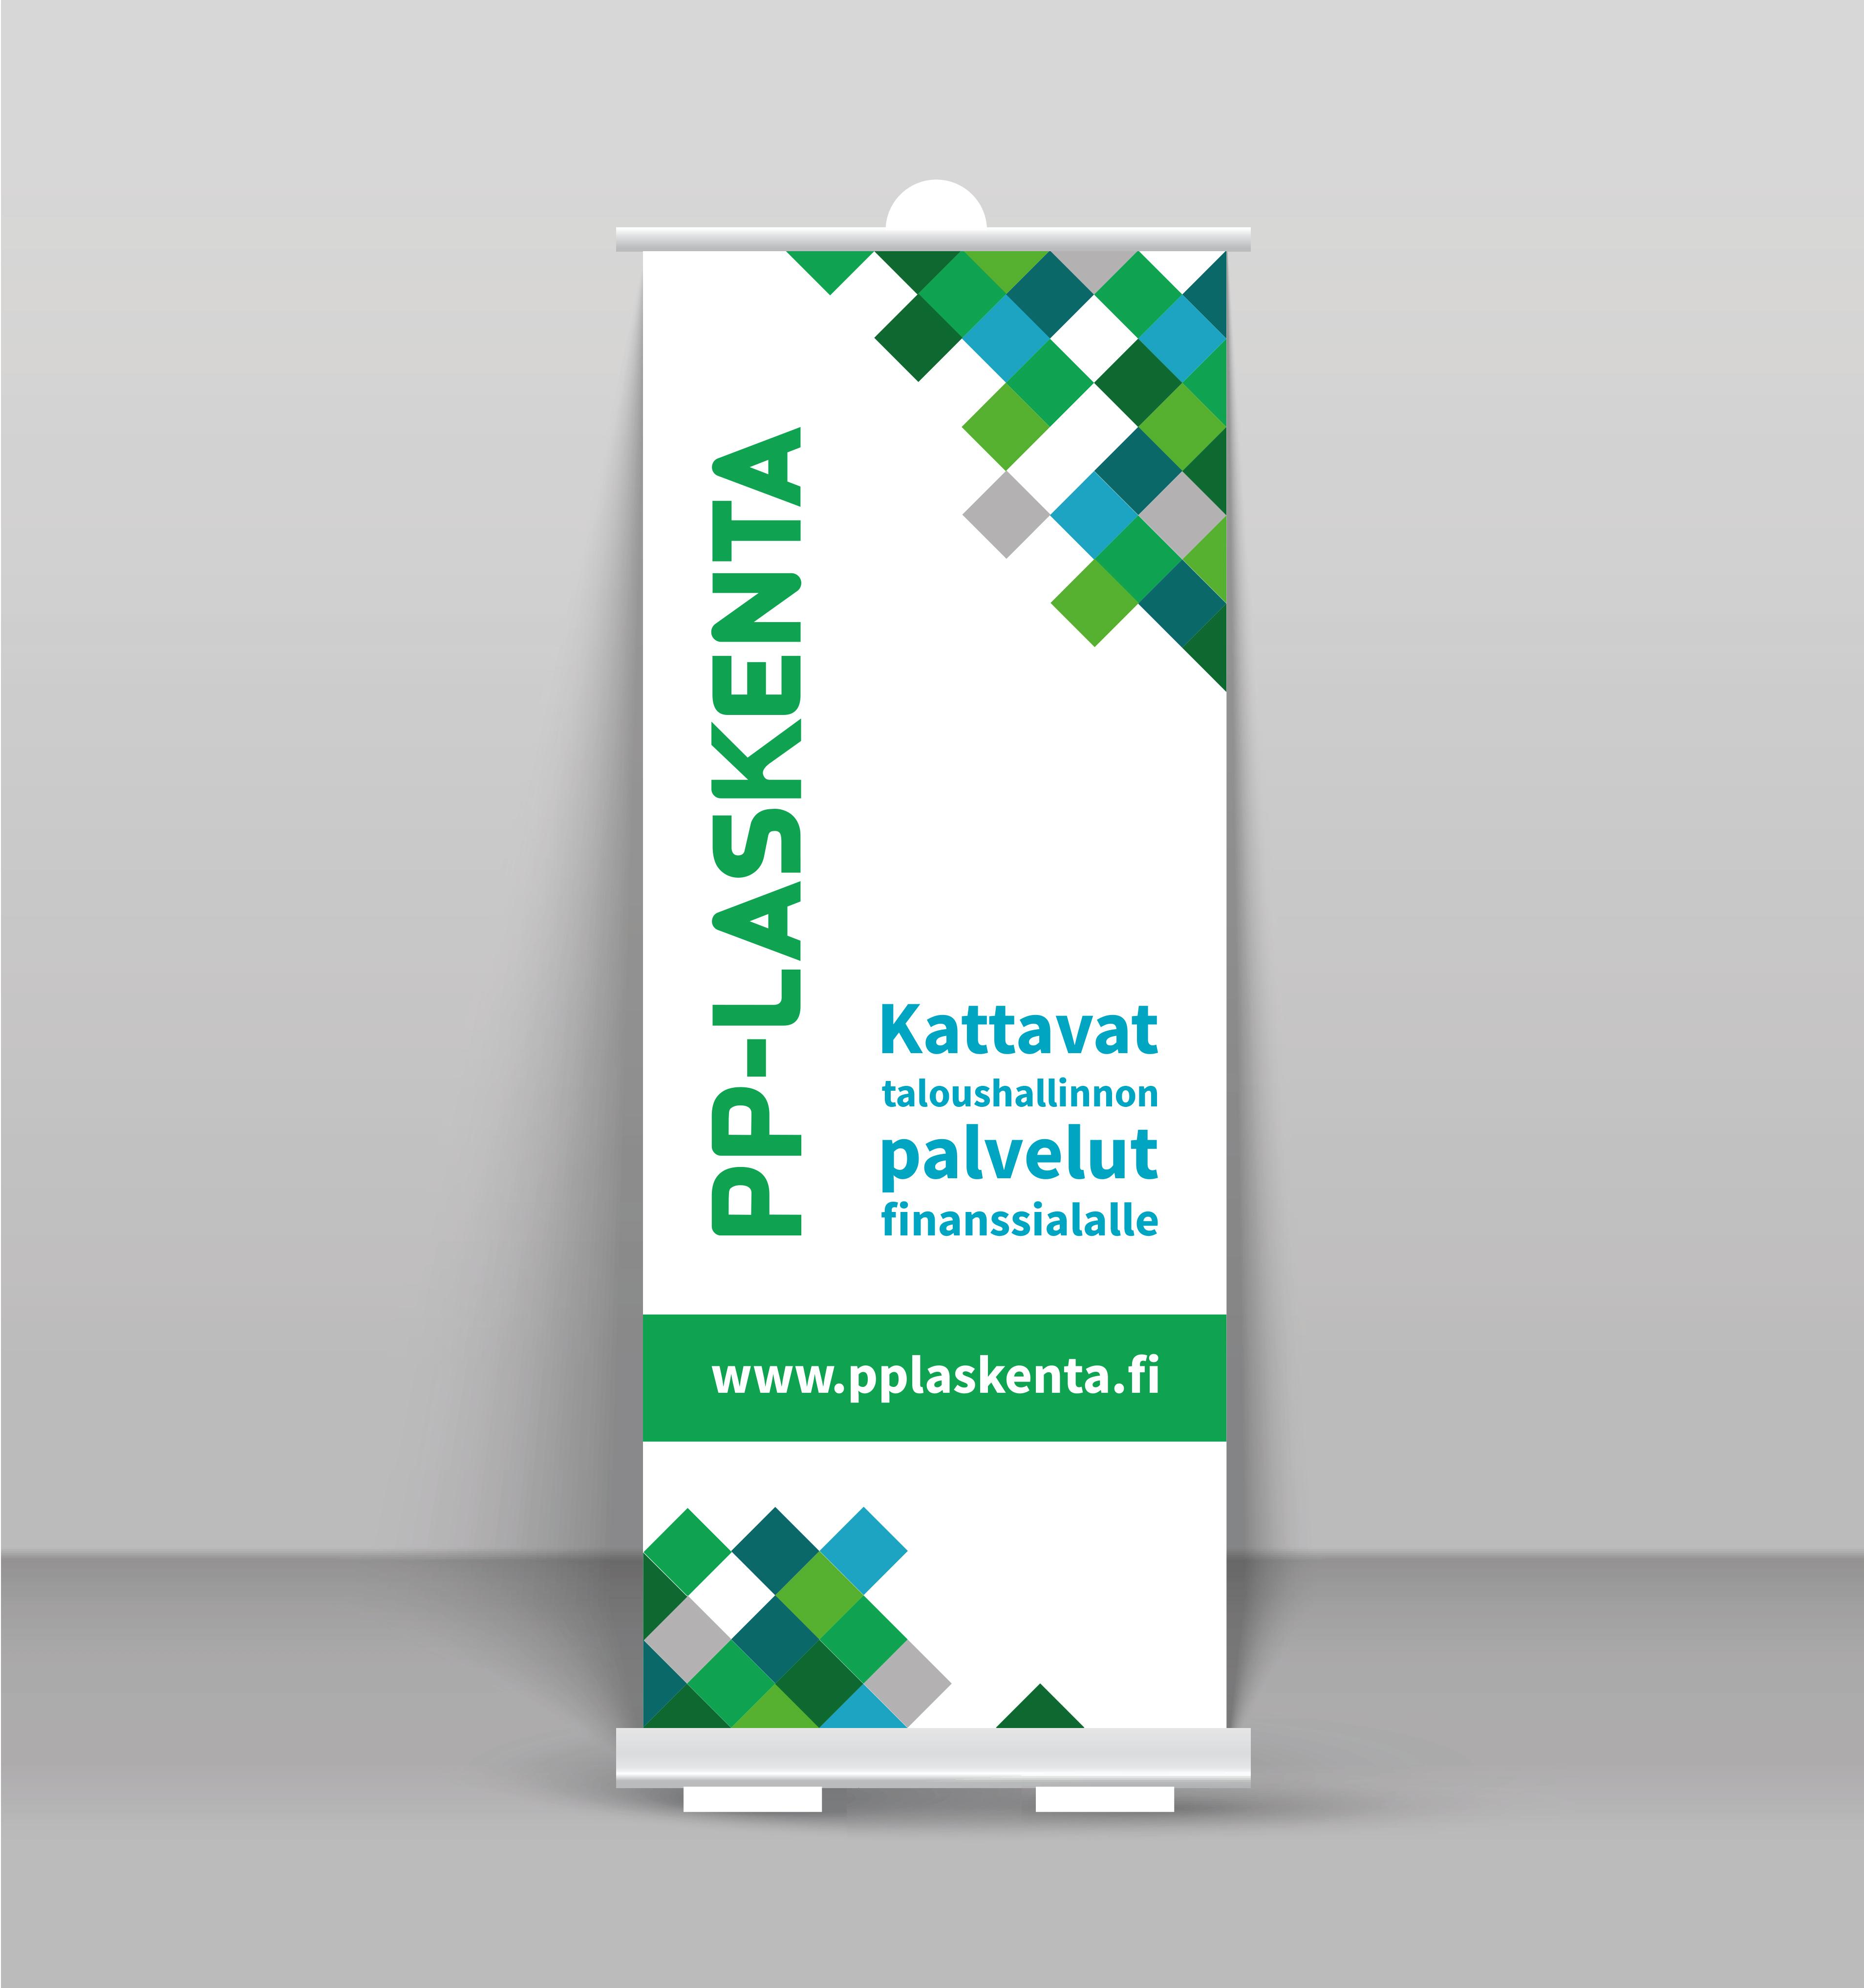 PP-Laskenta Rollup Referenssi Kumppania